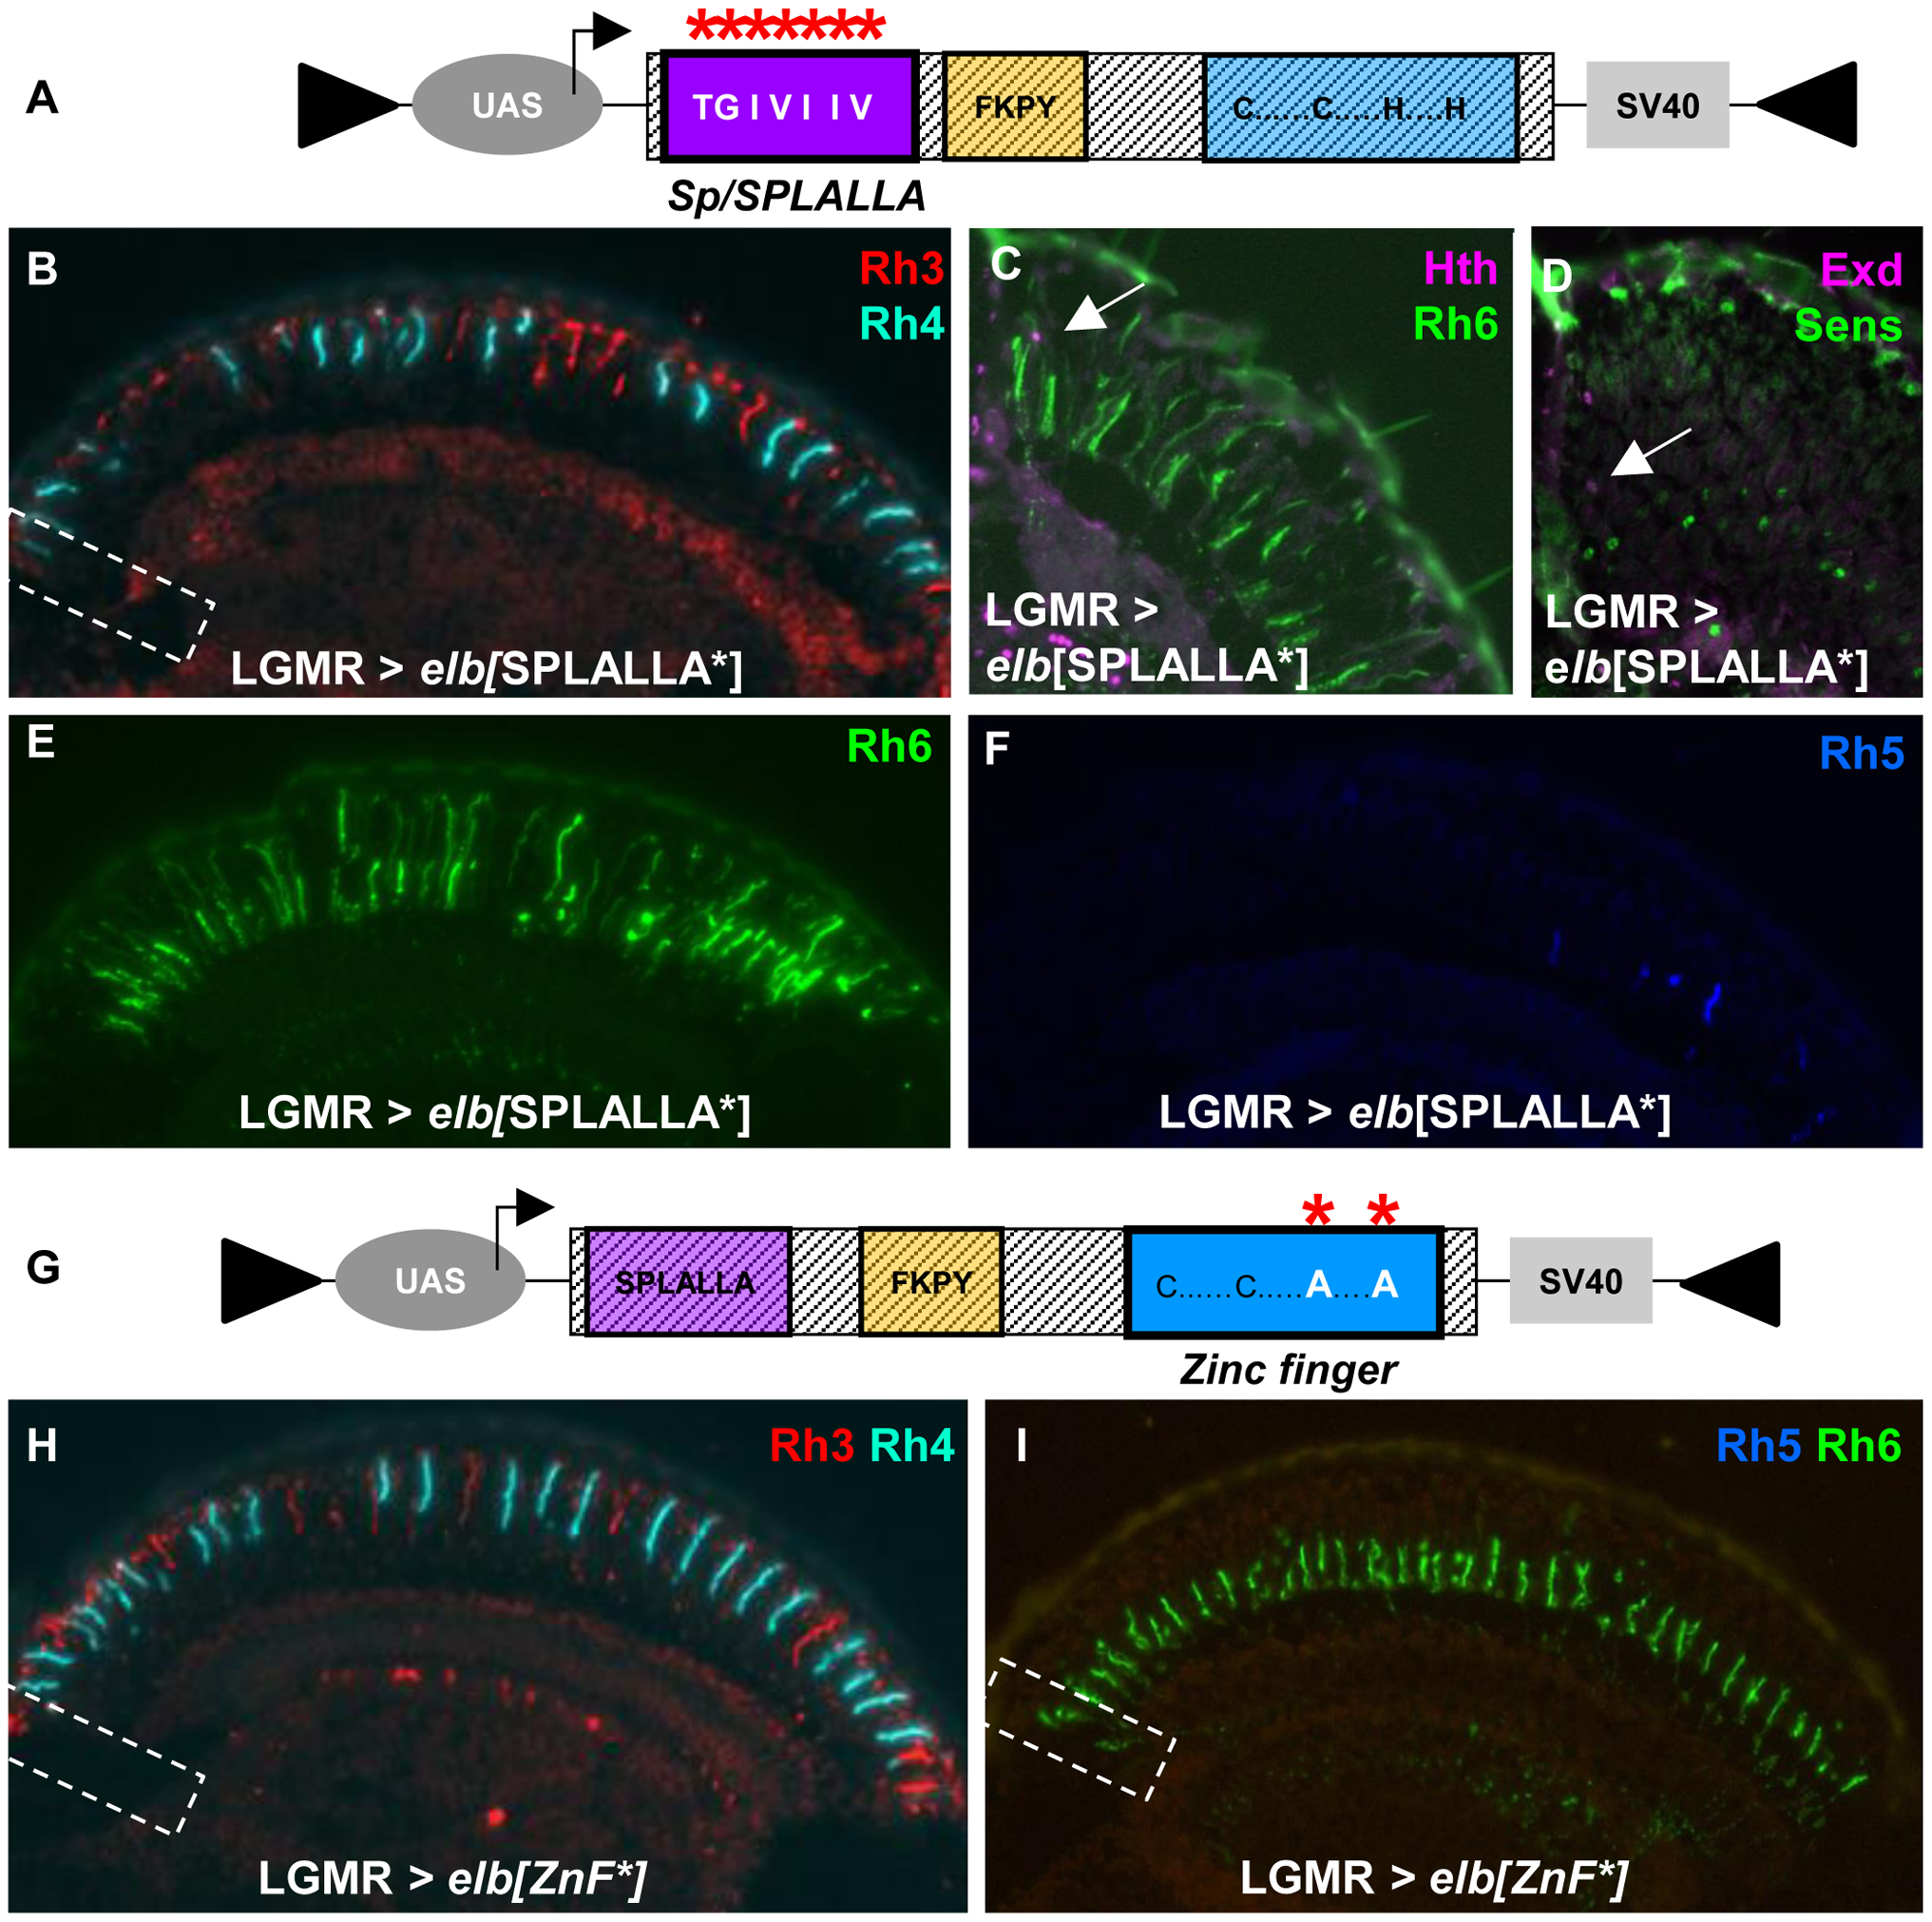 Mutagenesis of Sp/SPLALLA motif or zinc finger transform Elb into a dominant-negative.